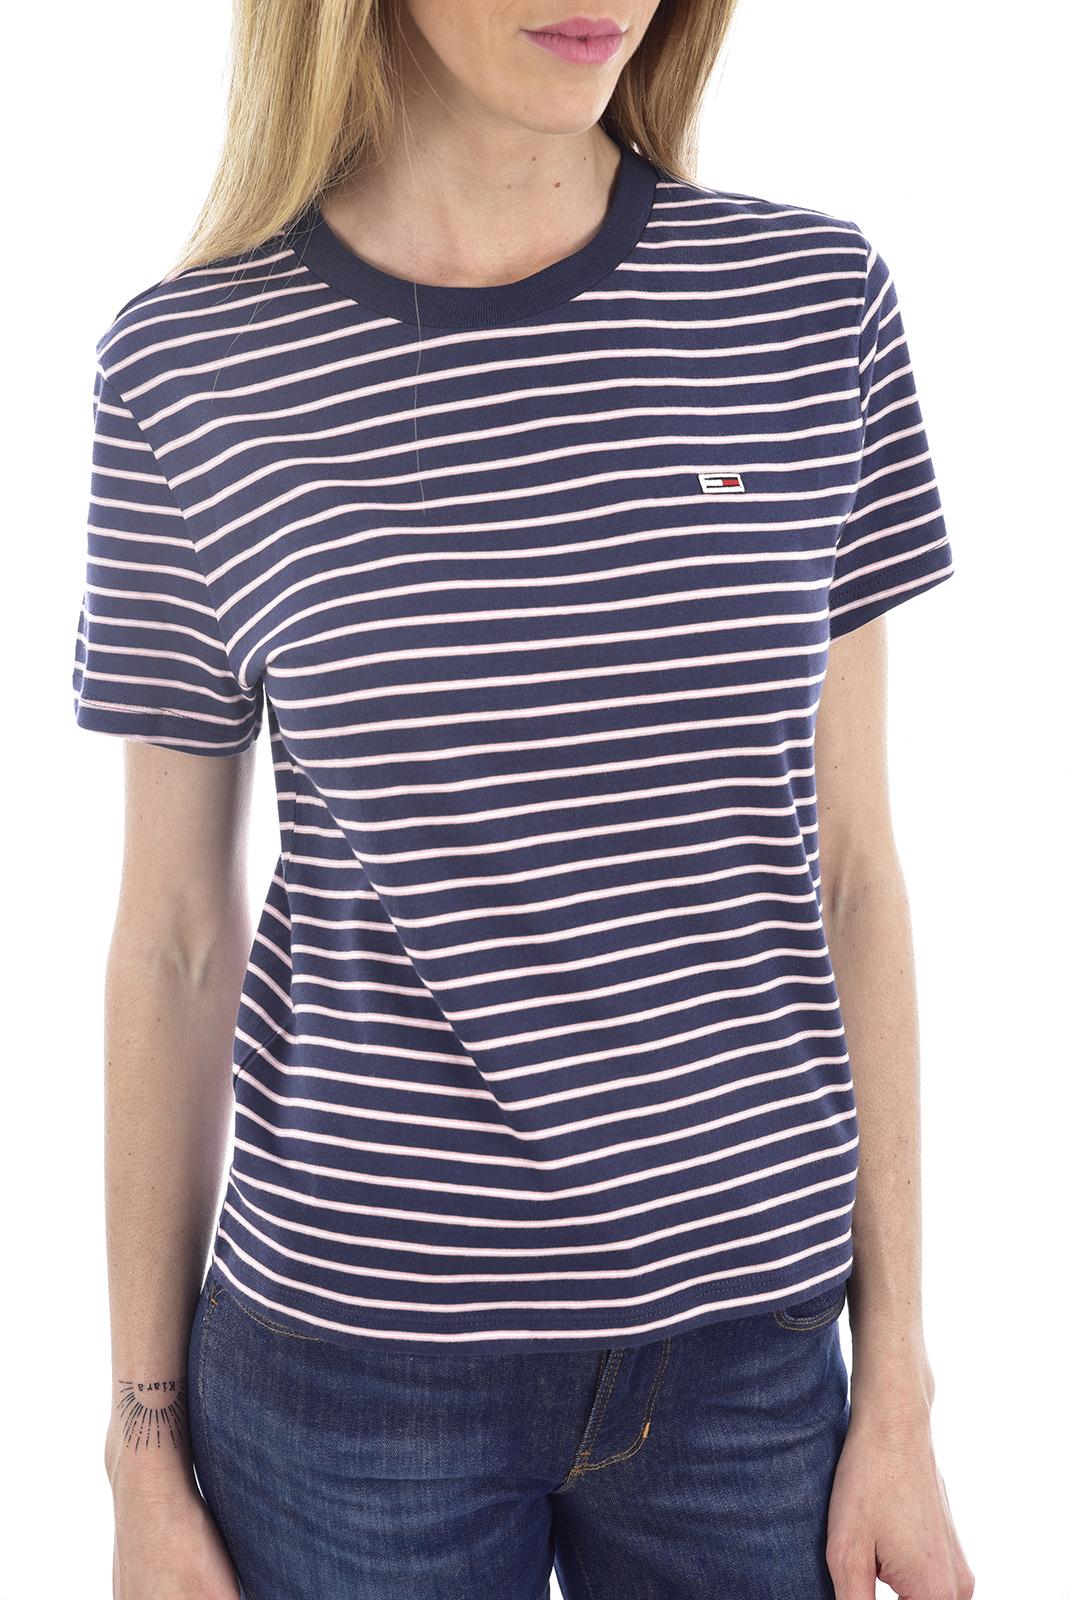 Tee shirt  Tommy Jeans DW0DW07140 0A4 black iris /multi